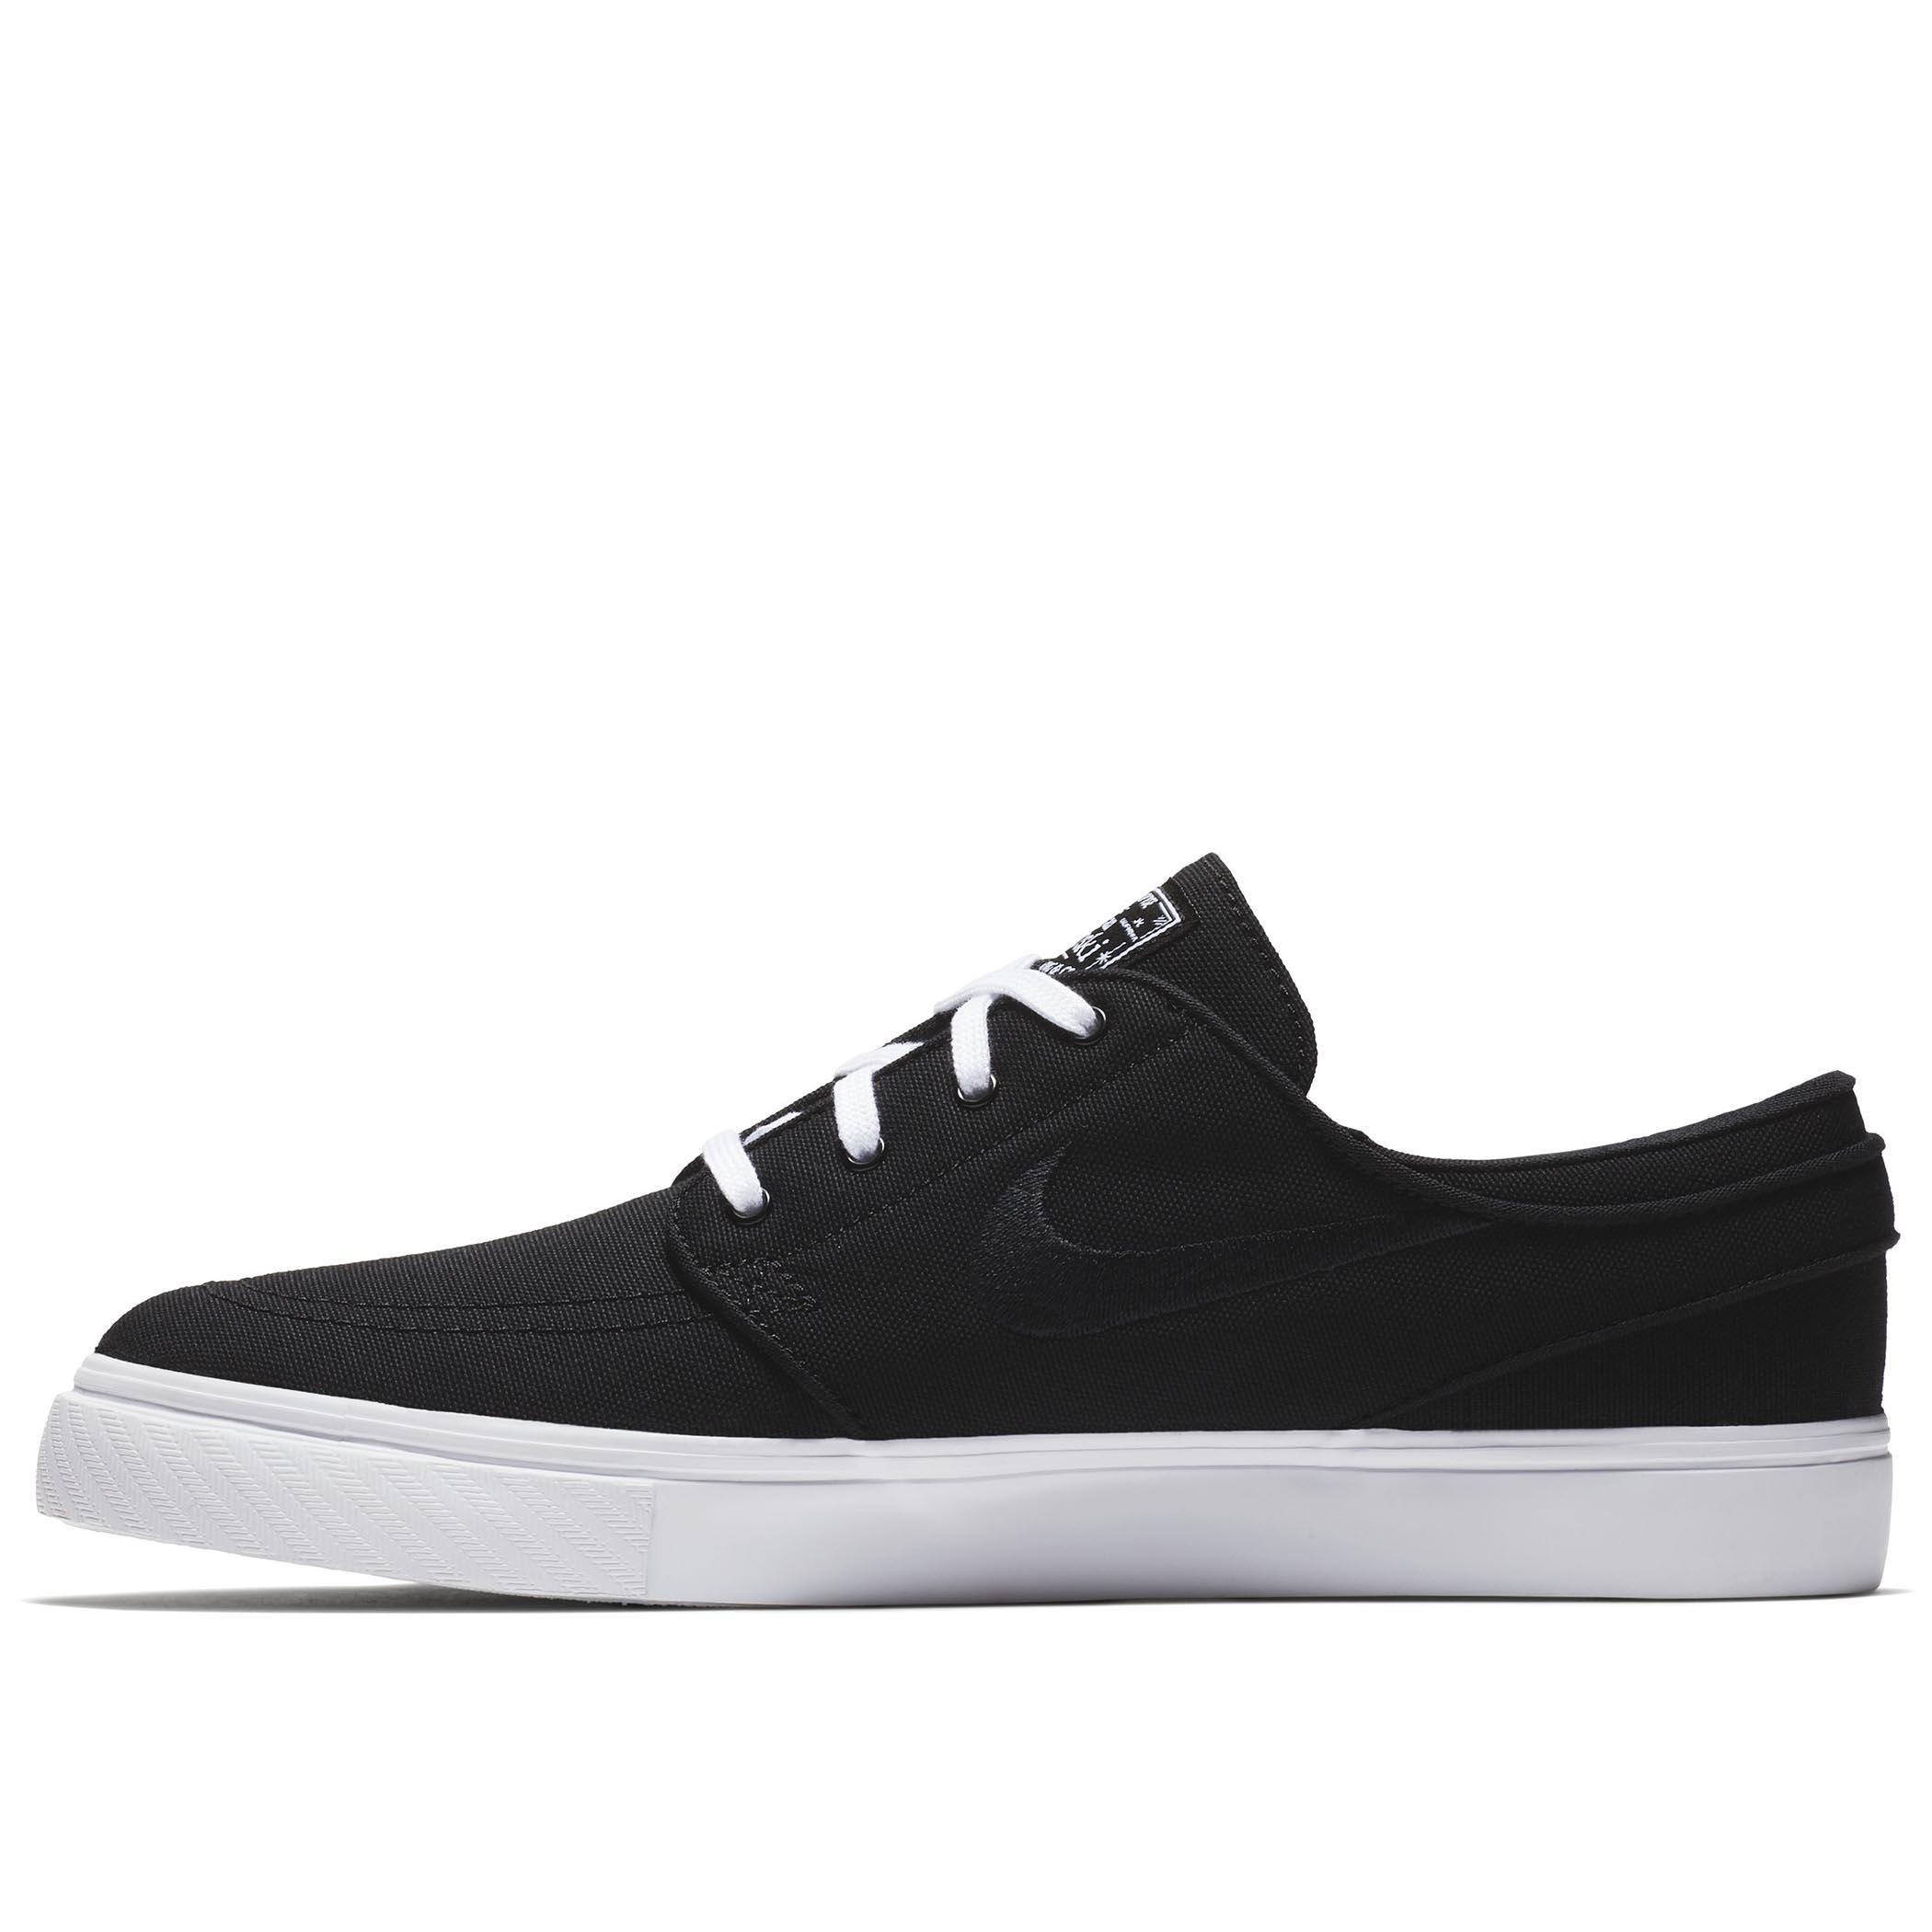 finest selection d9525 666a6 Мужские кеды Nike SB Zoom Stefan Janoski Canvas Black Black-White - фото 1